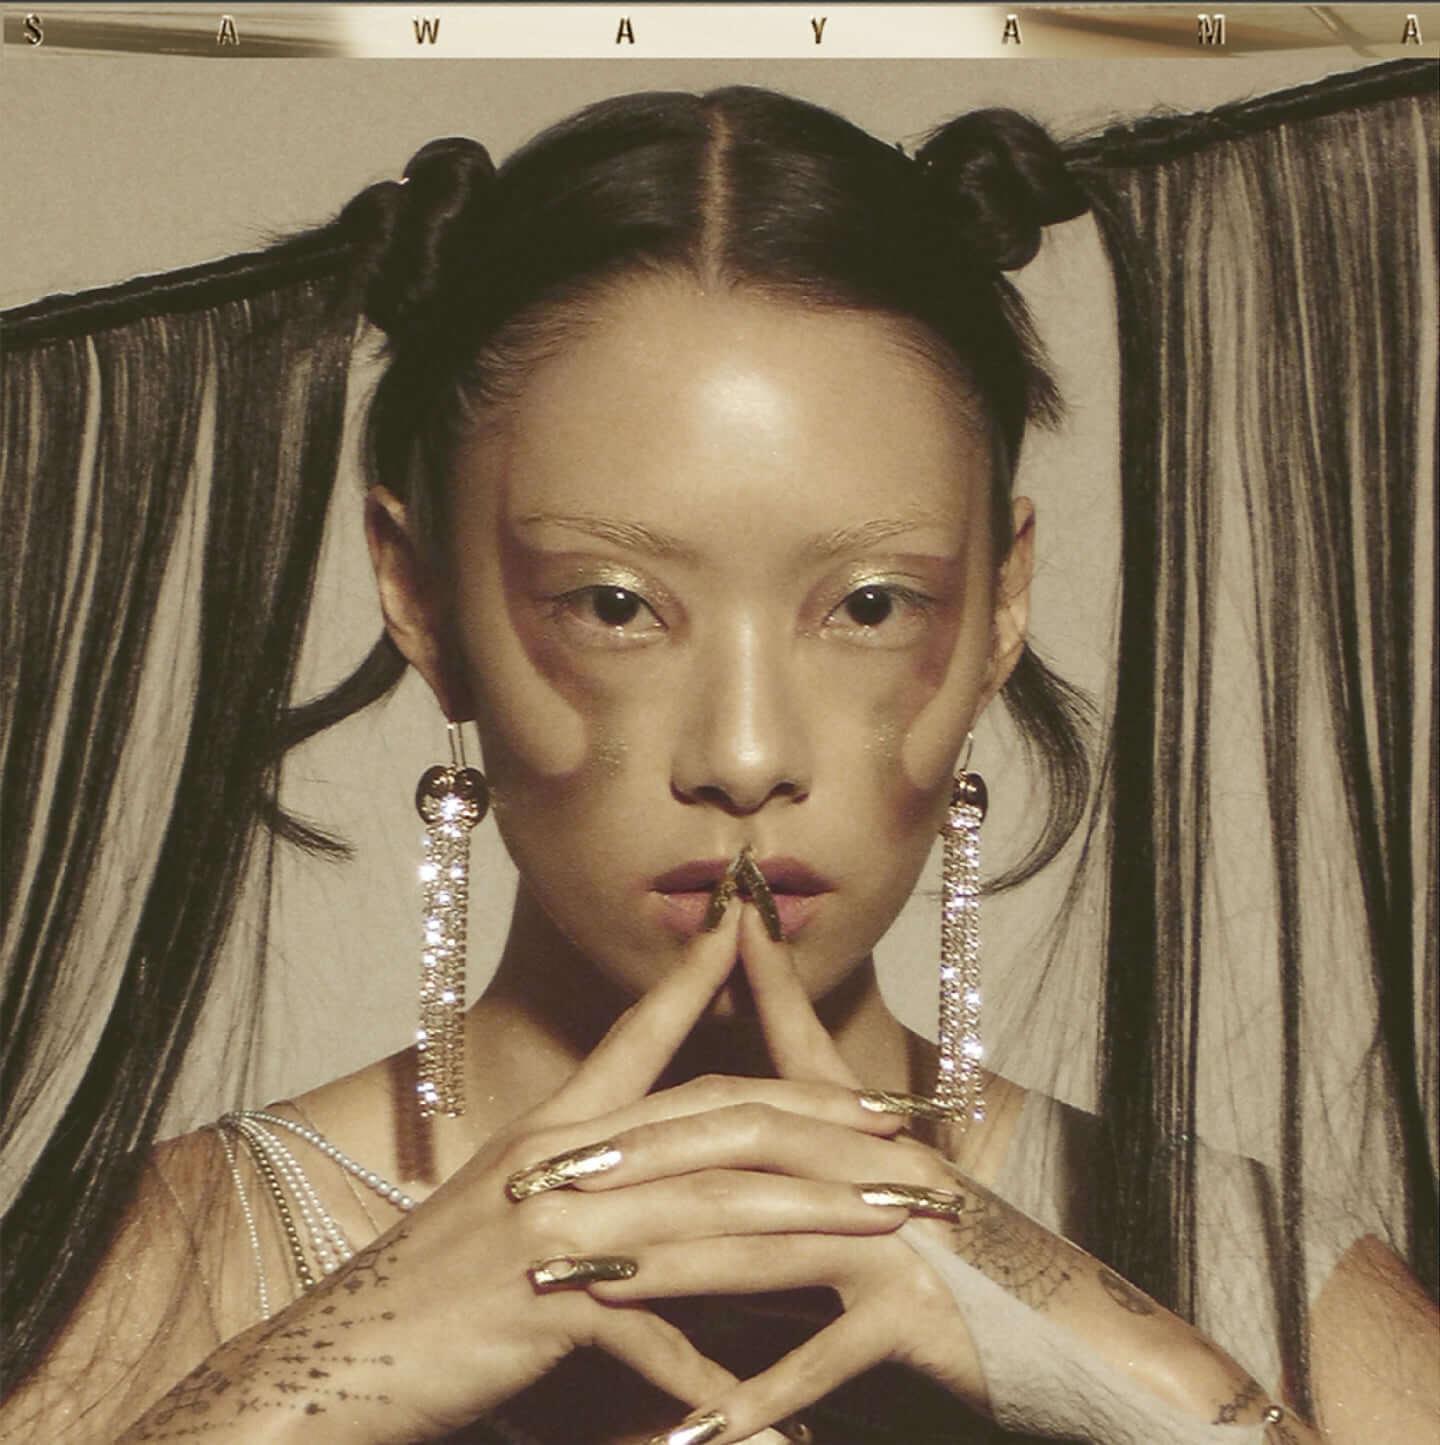 "VOGUEも注目のSSWリナ・サワヤマがデビュー・アルバム『SAWAYAMA』から新曲""Choesen Family""をリリース music200403_rinasawayama_01-1-1440x1445"